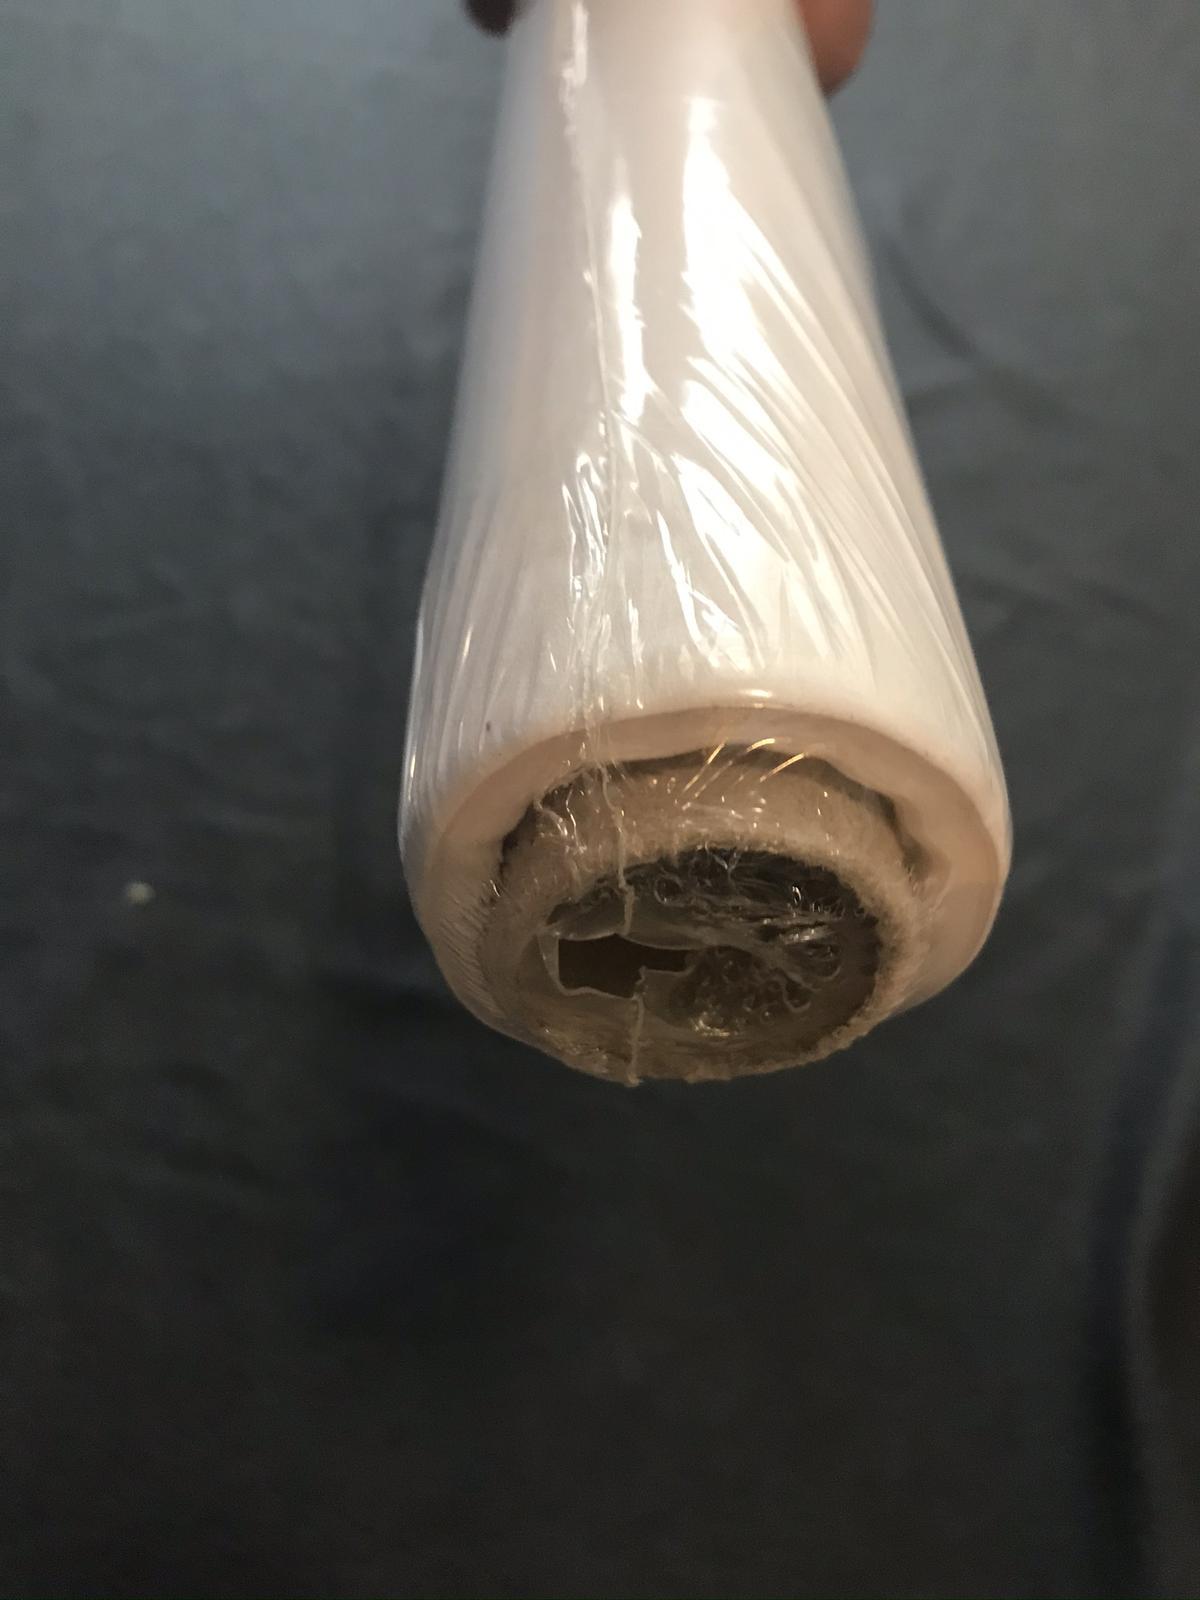 Papírový ubrus bílý (1,25 m x 5 m) - Obrázek č. 1